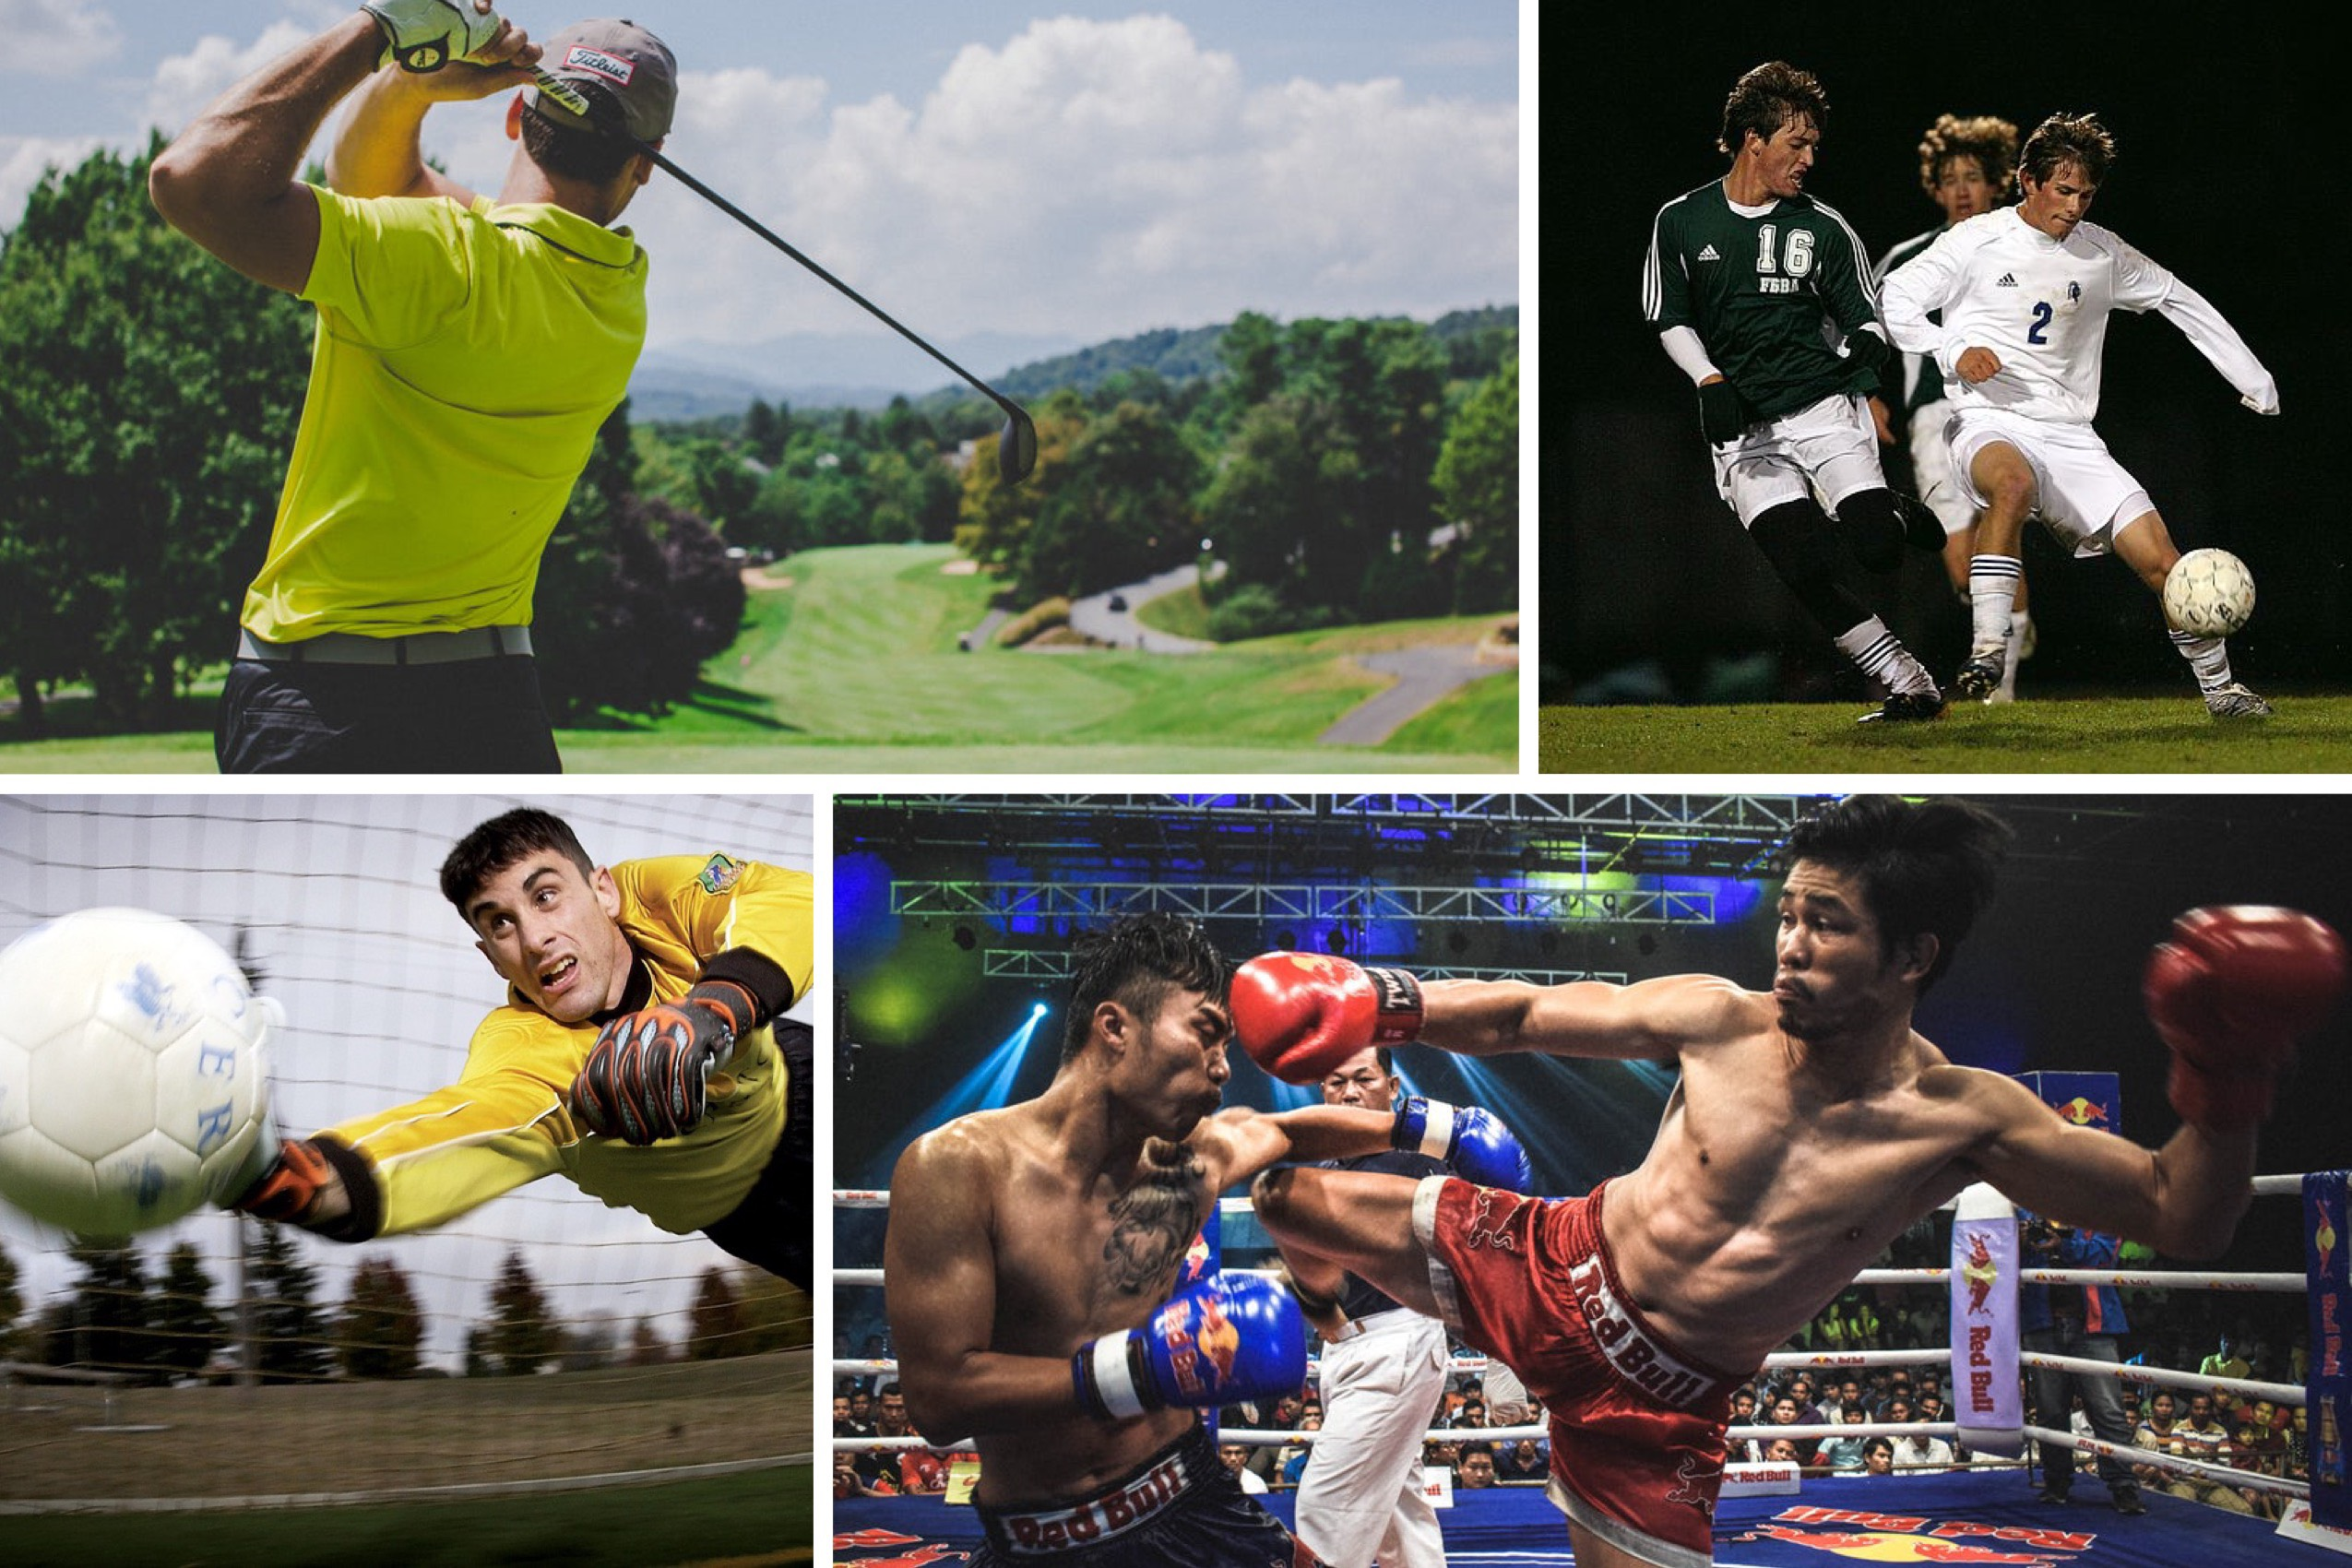 sport professionali